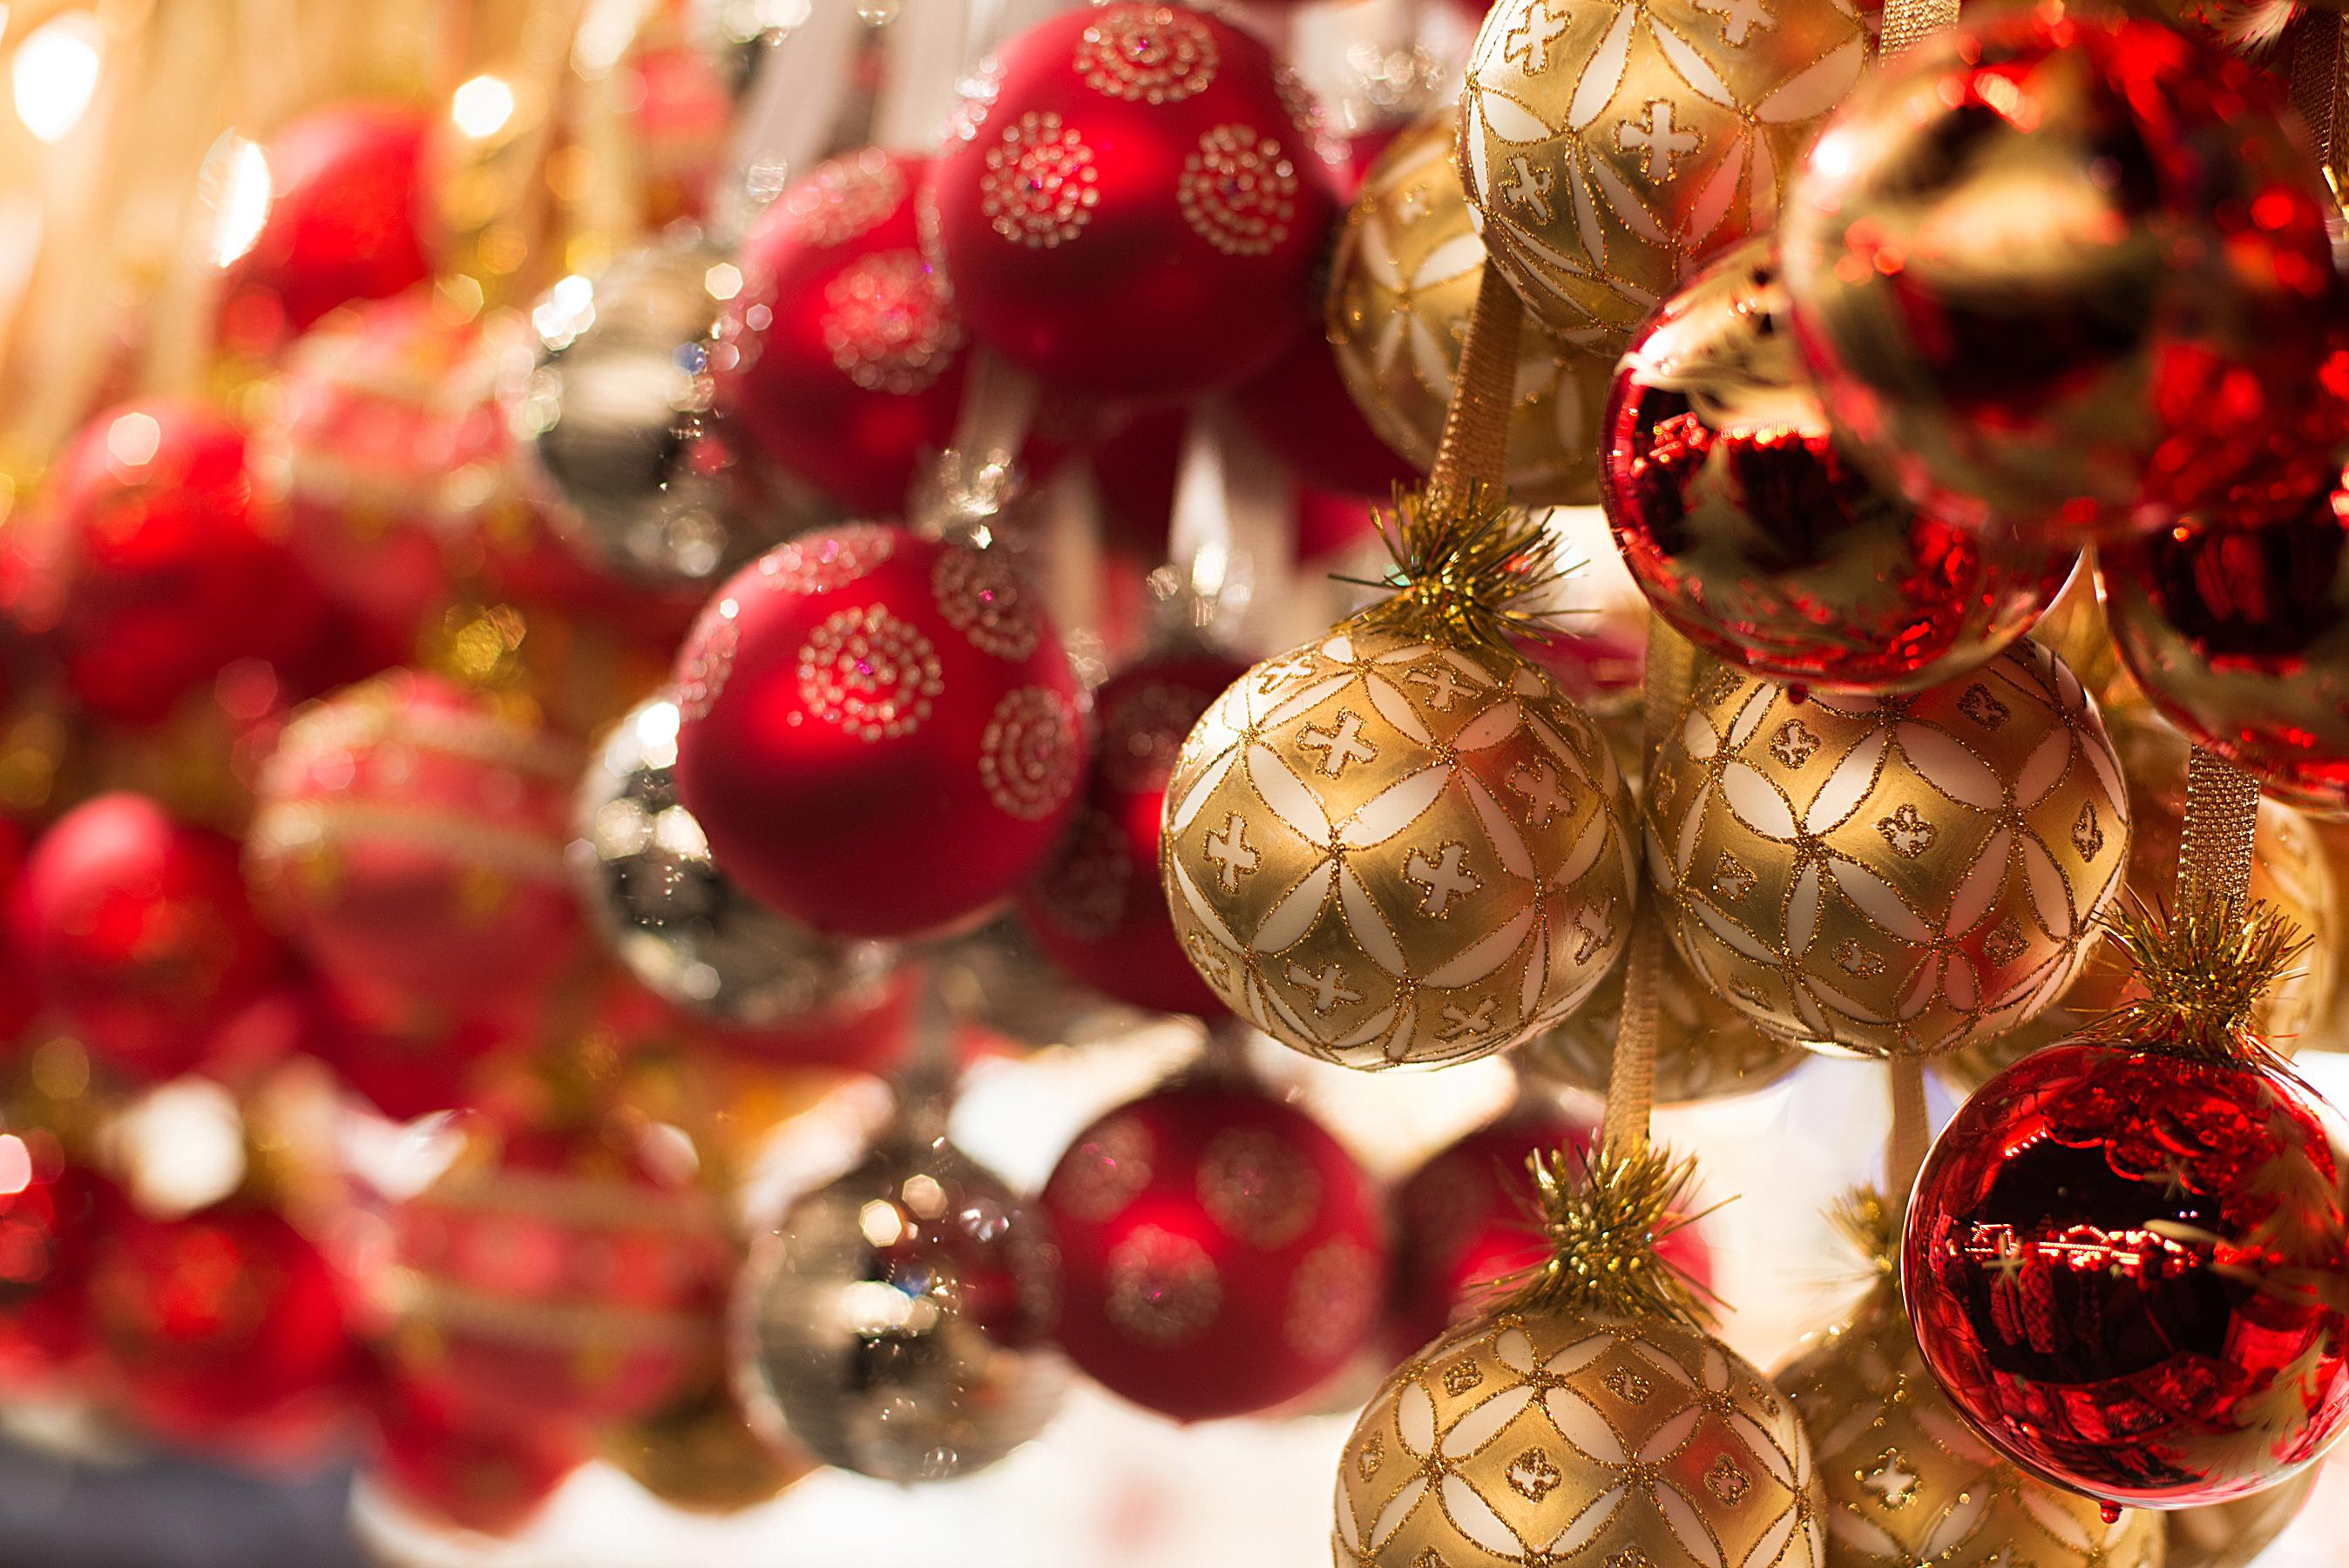 frankfurt-christmas-market-6-nowwhatstheplan